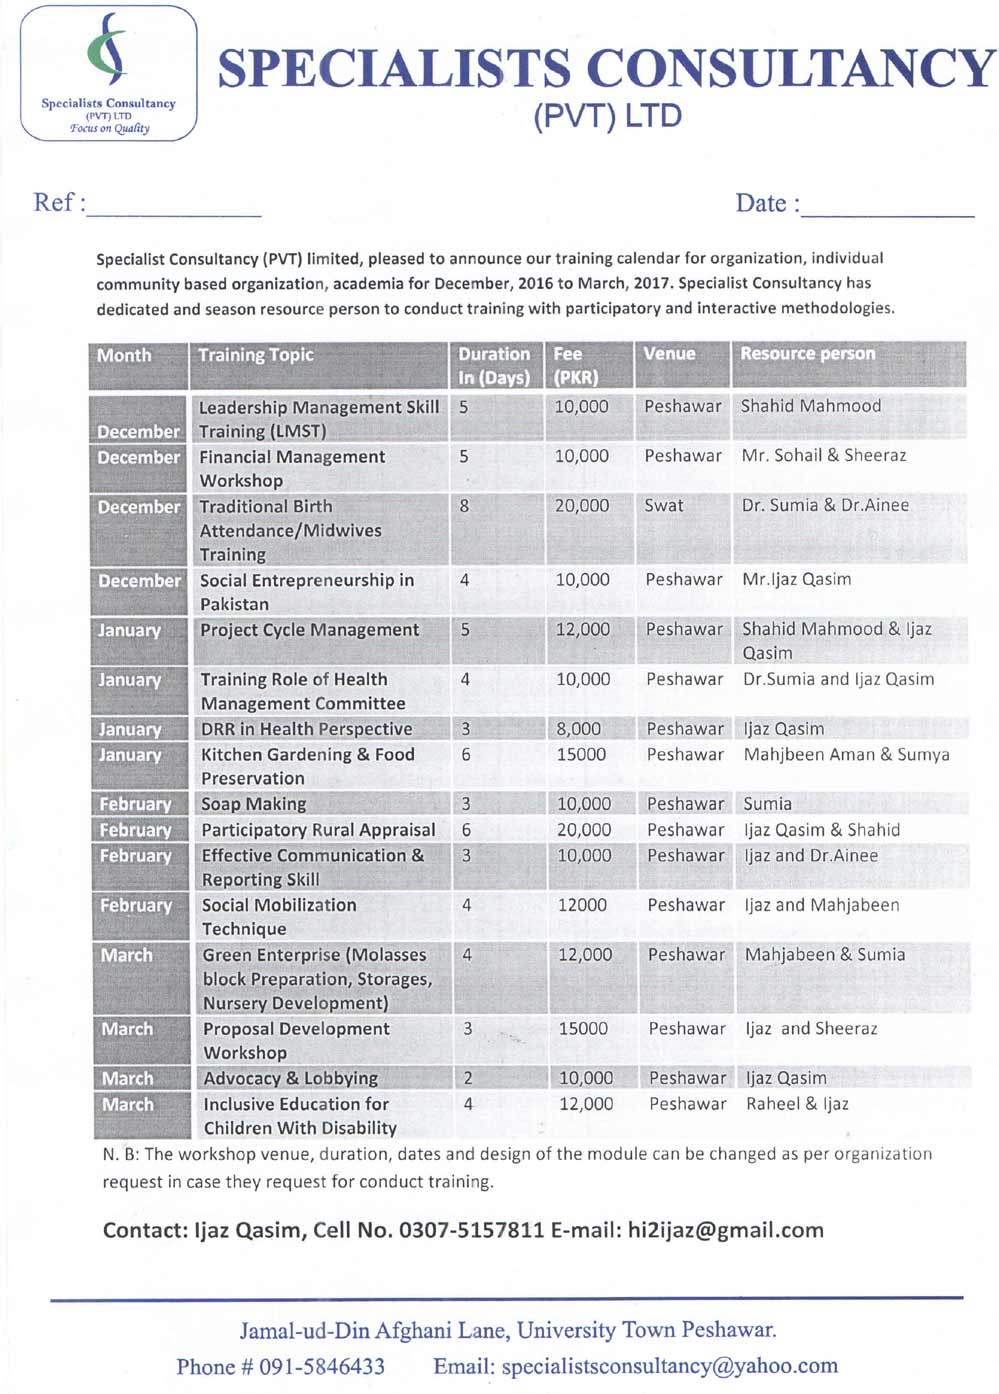 Organization Training Calendar : Training calendar for organization individual community